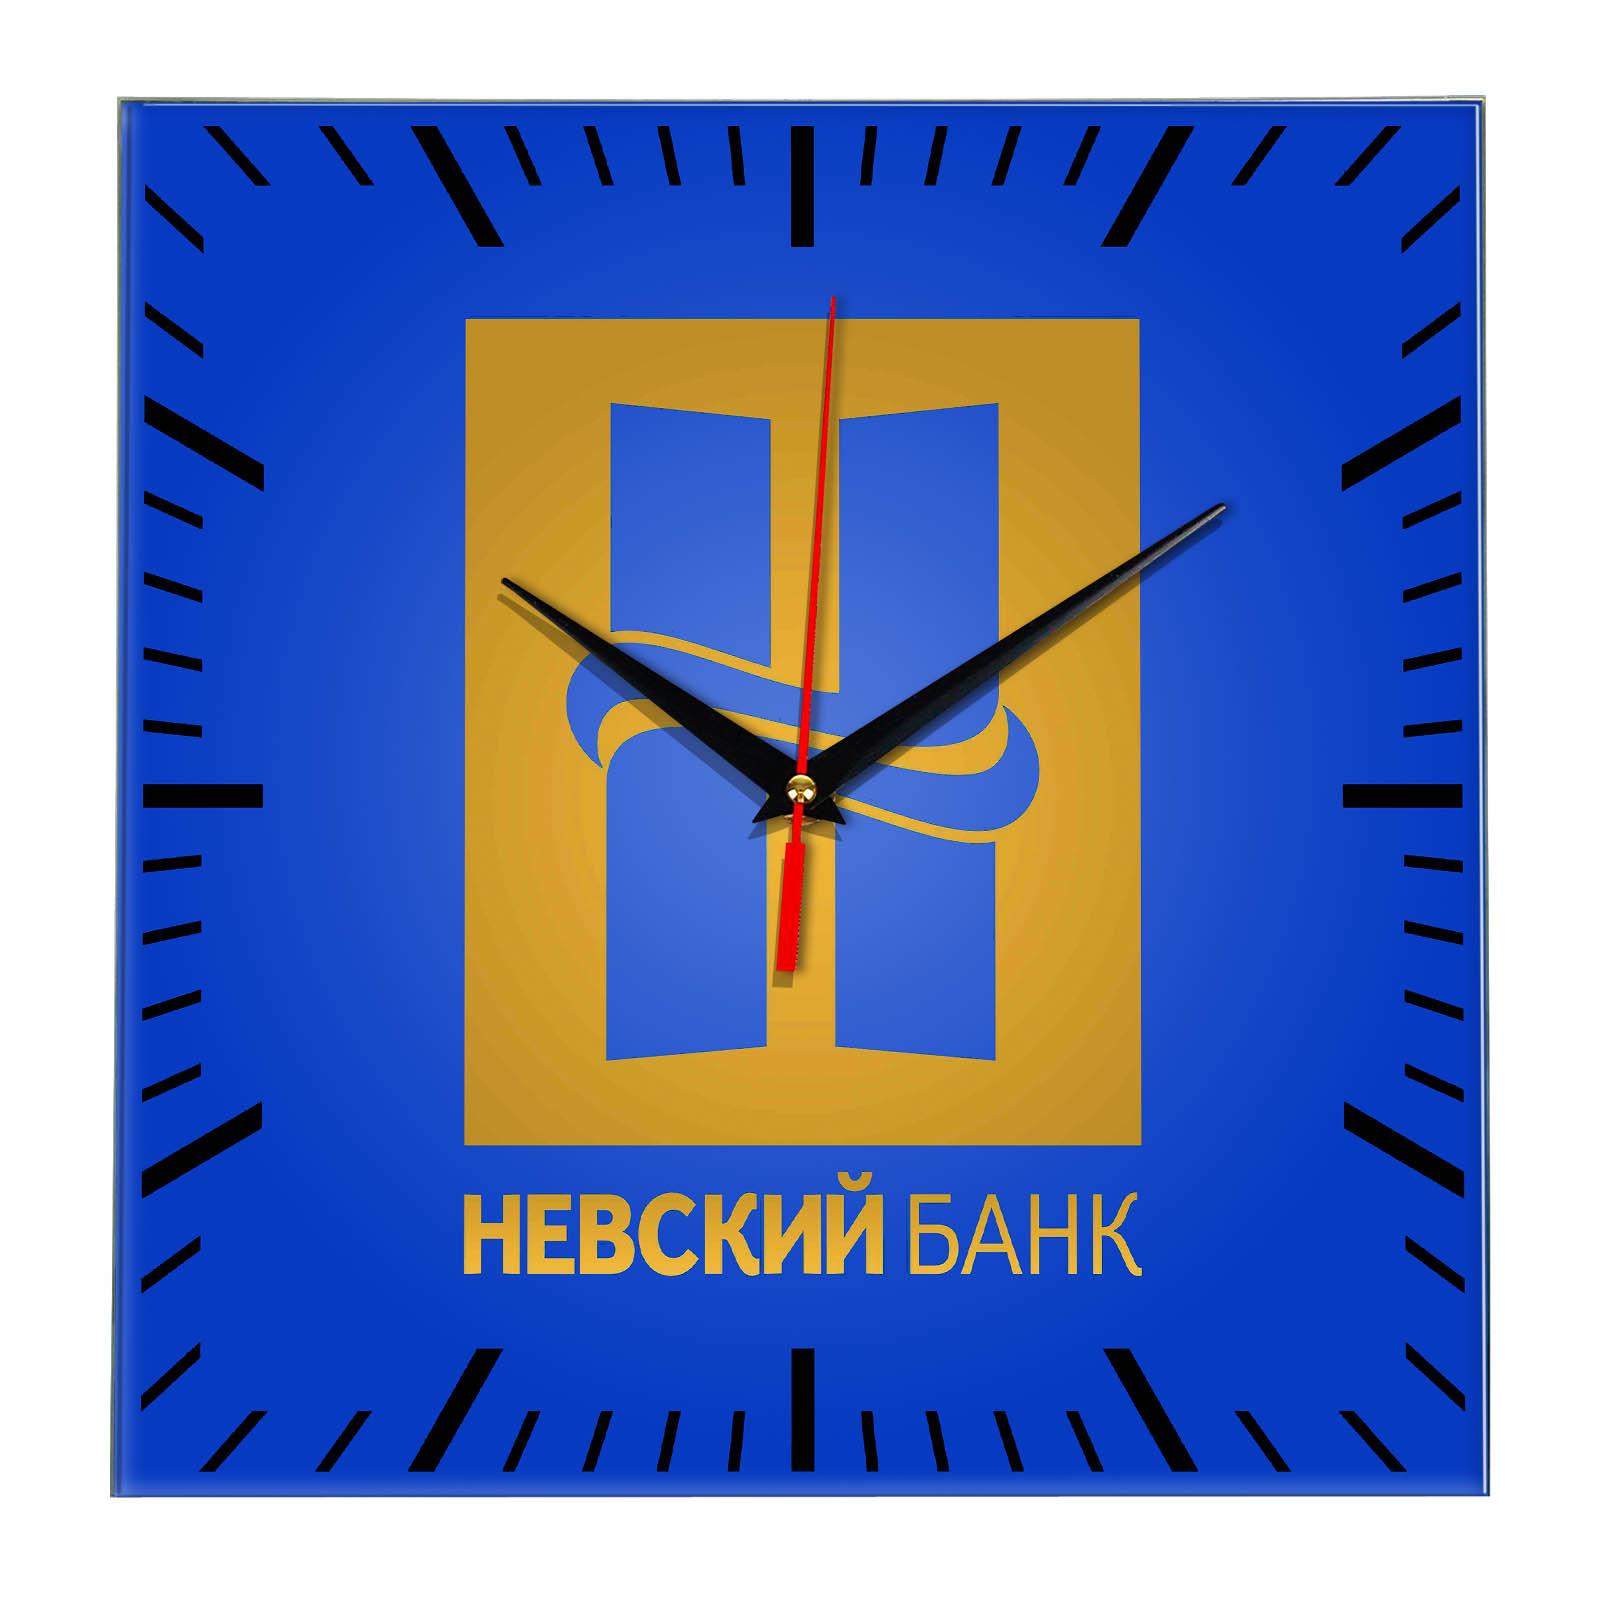 nevskiy_bank_0013_svetl-kvadtat